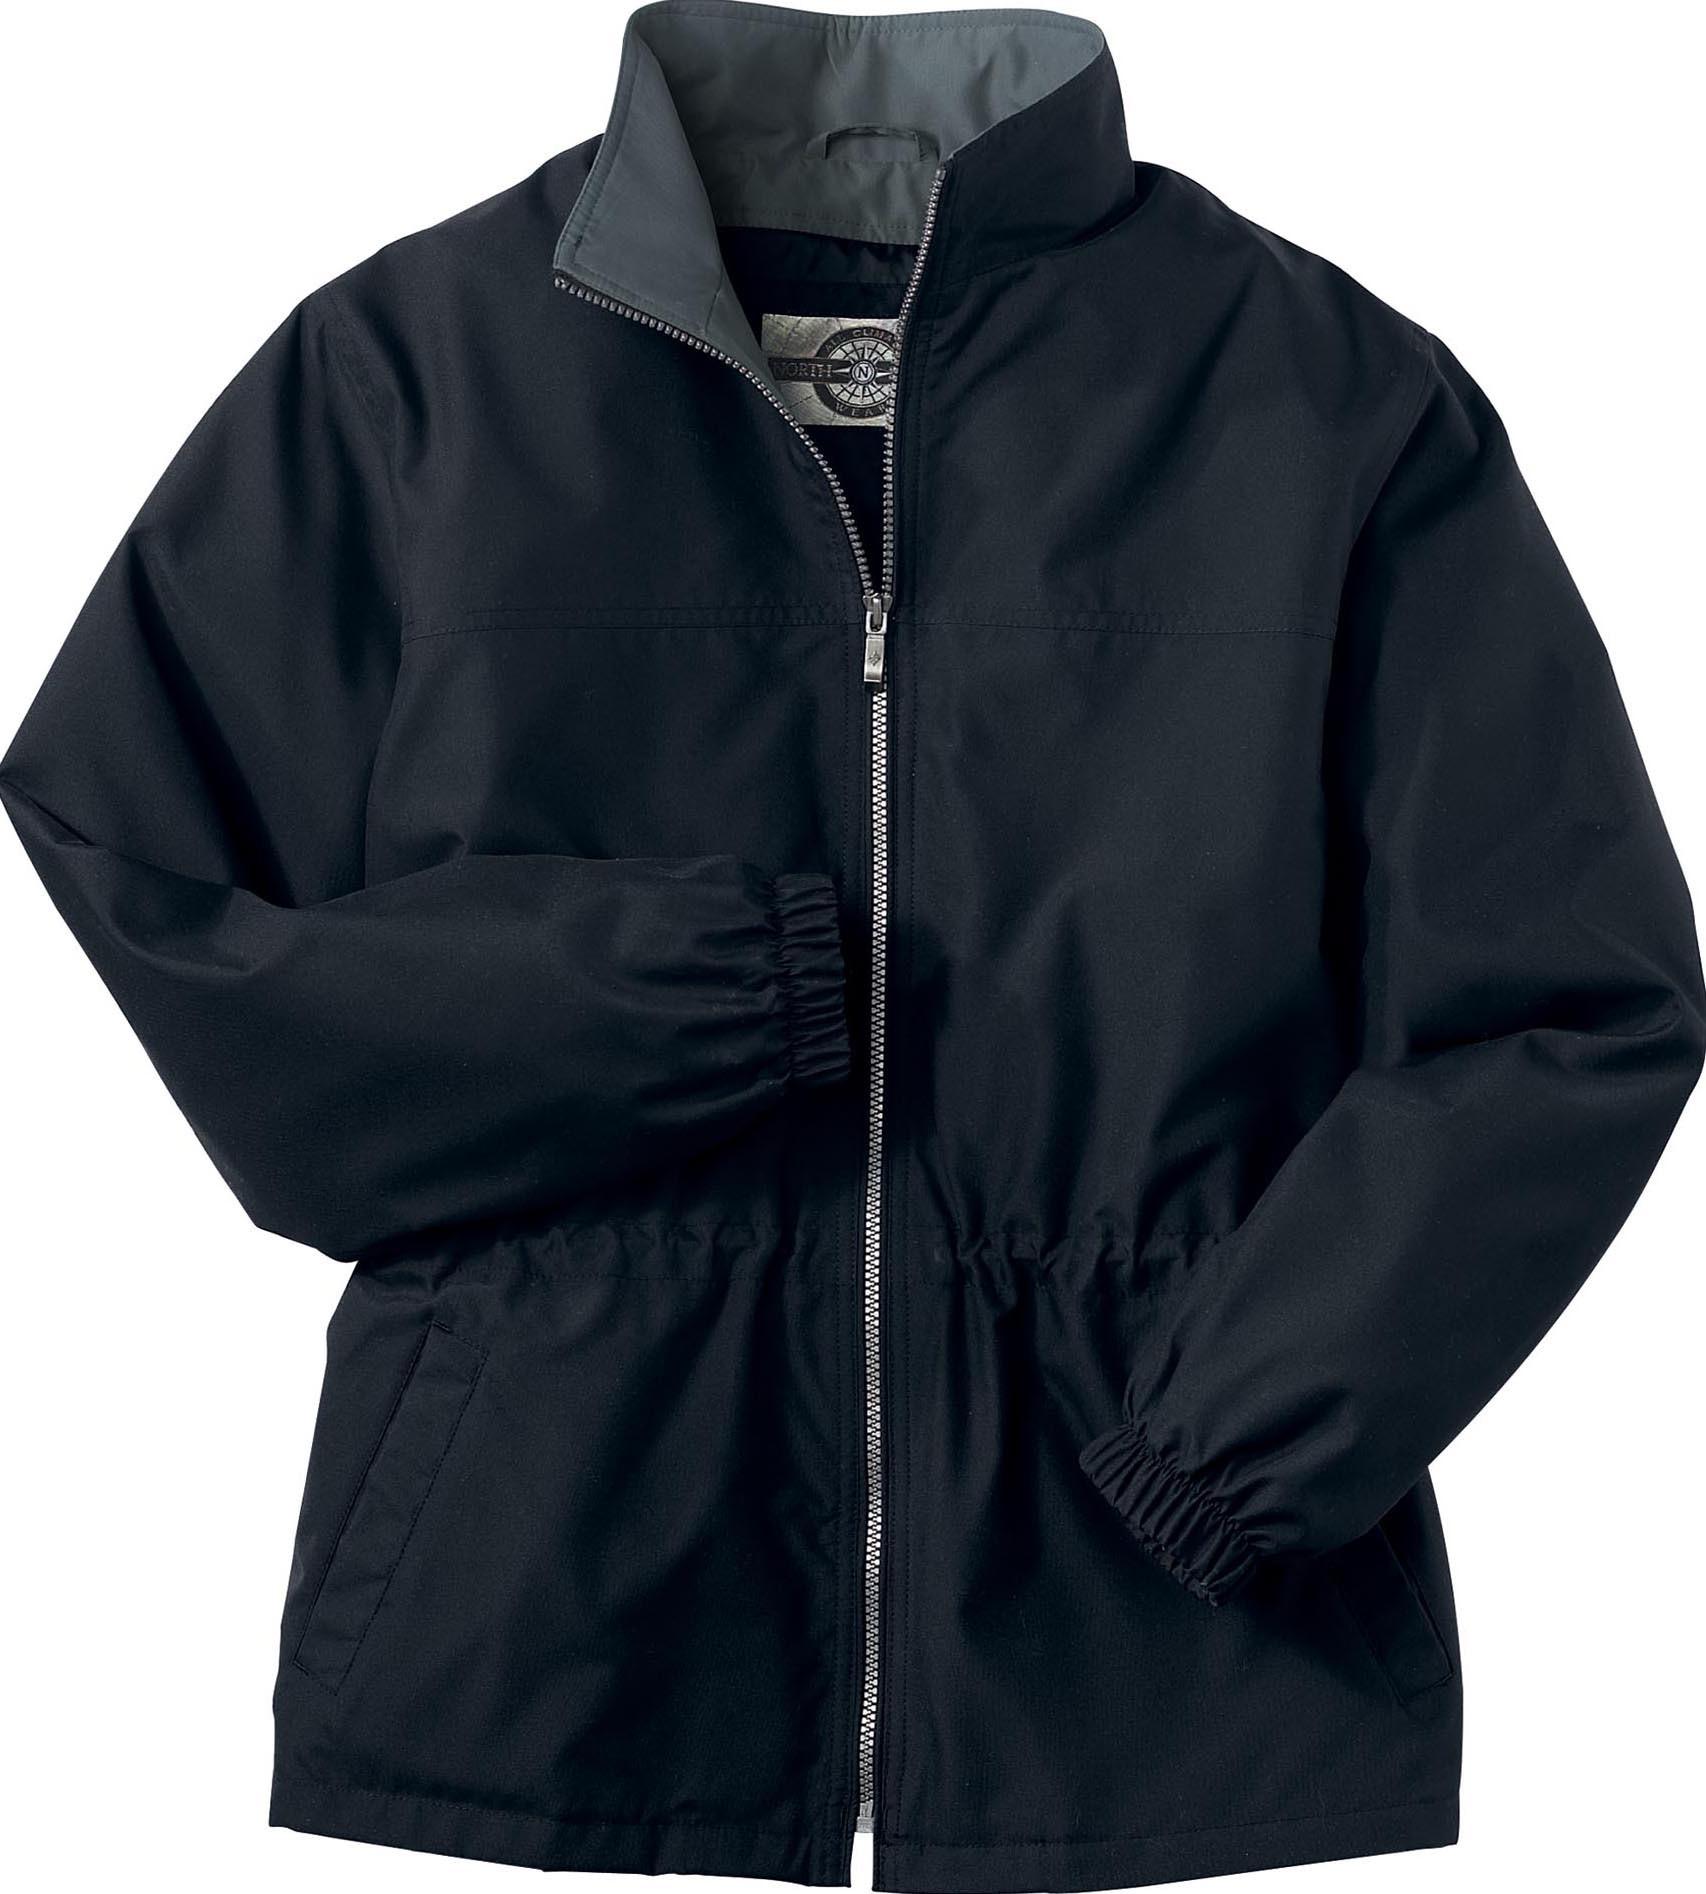 Ash City Lightweight 78011 - Ladies' Micro Plus Three Quarter Length Jacket With Teflon